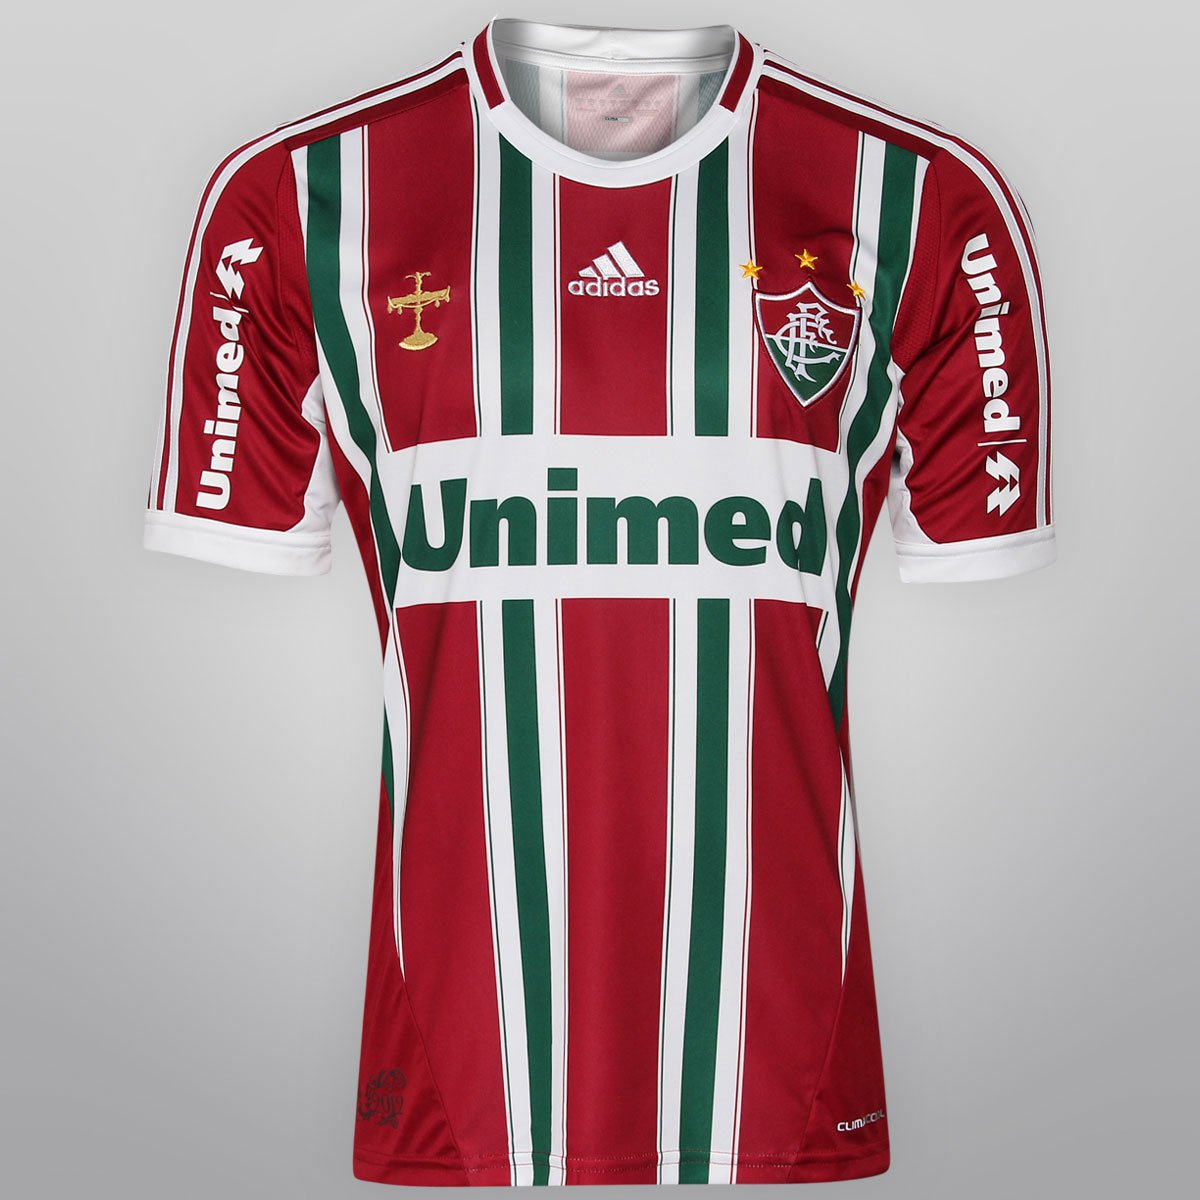 Camisa Adidas Fluminense IV 12 13 s nº - Compre Agora  09c4596dea971